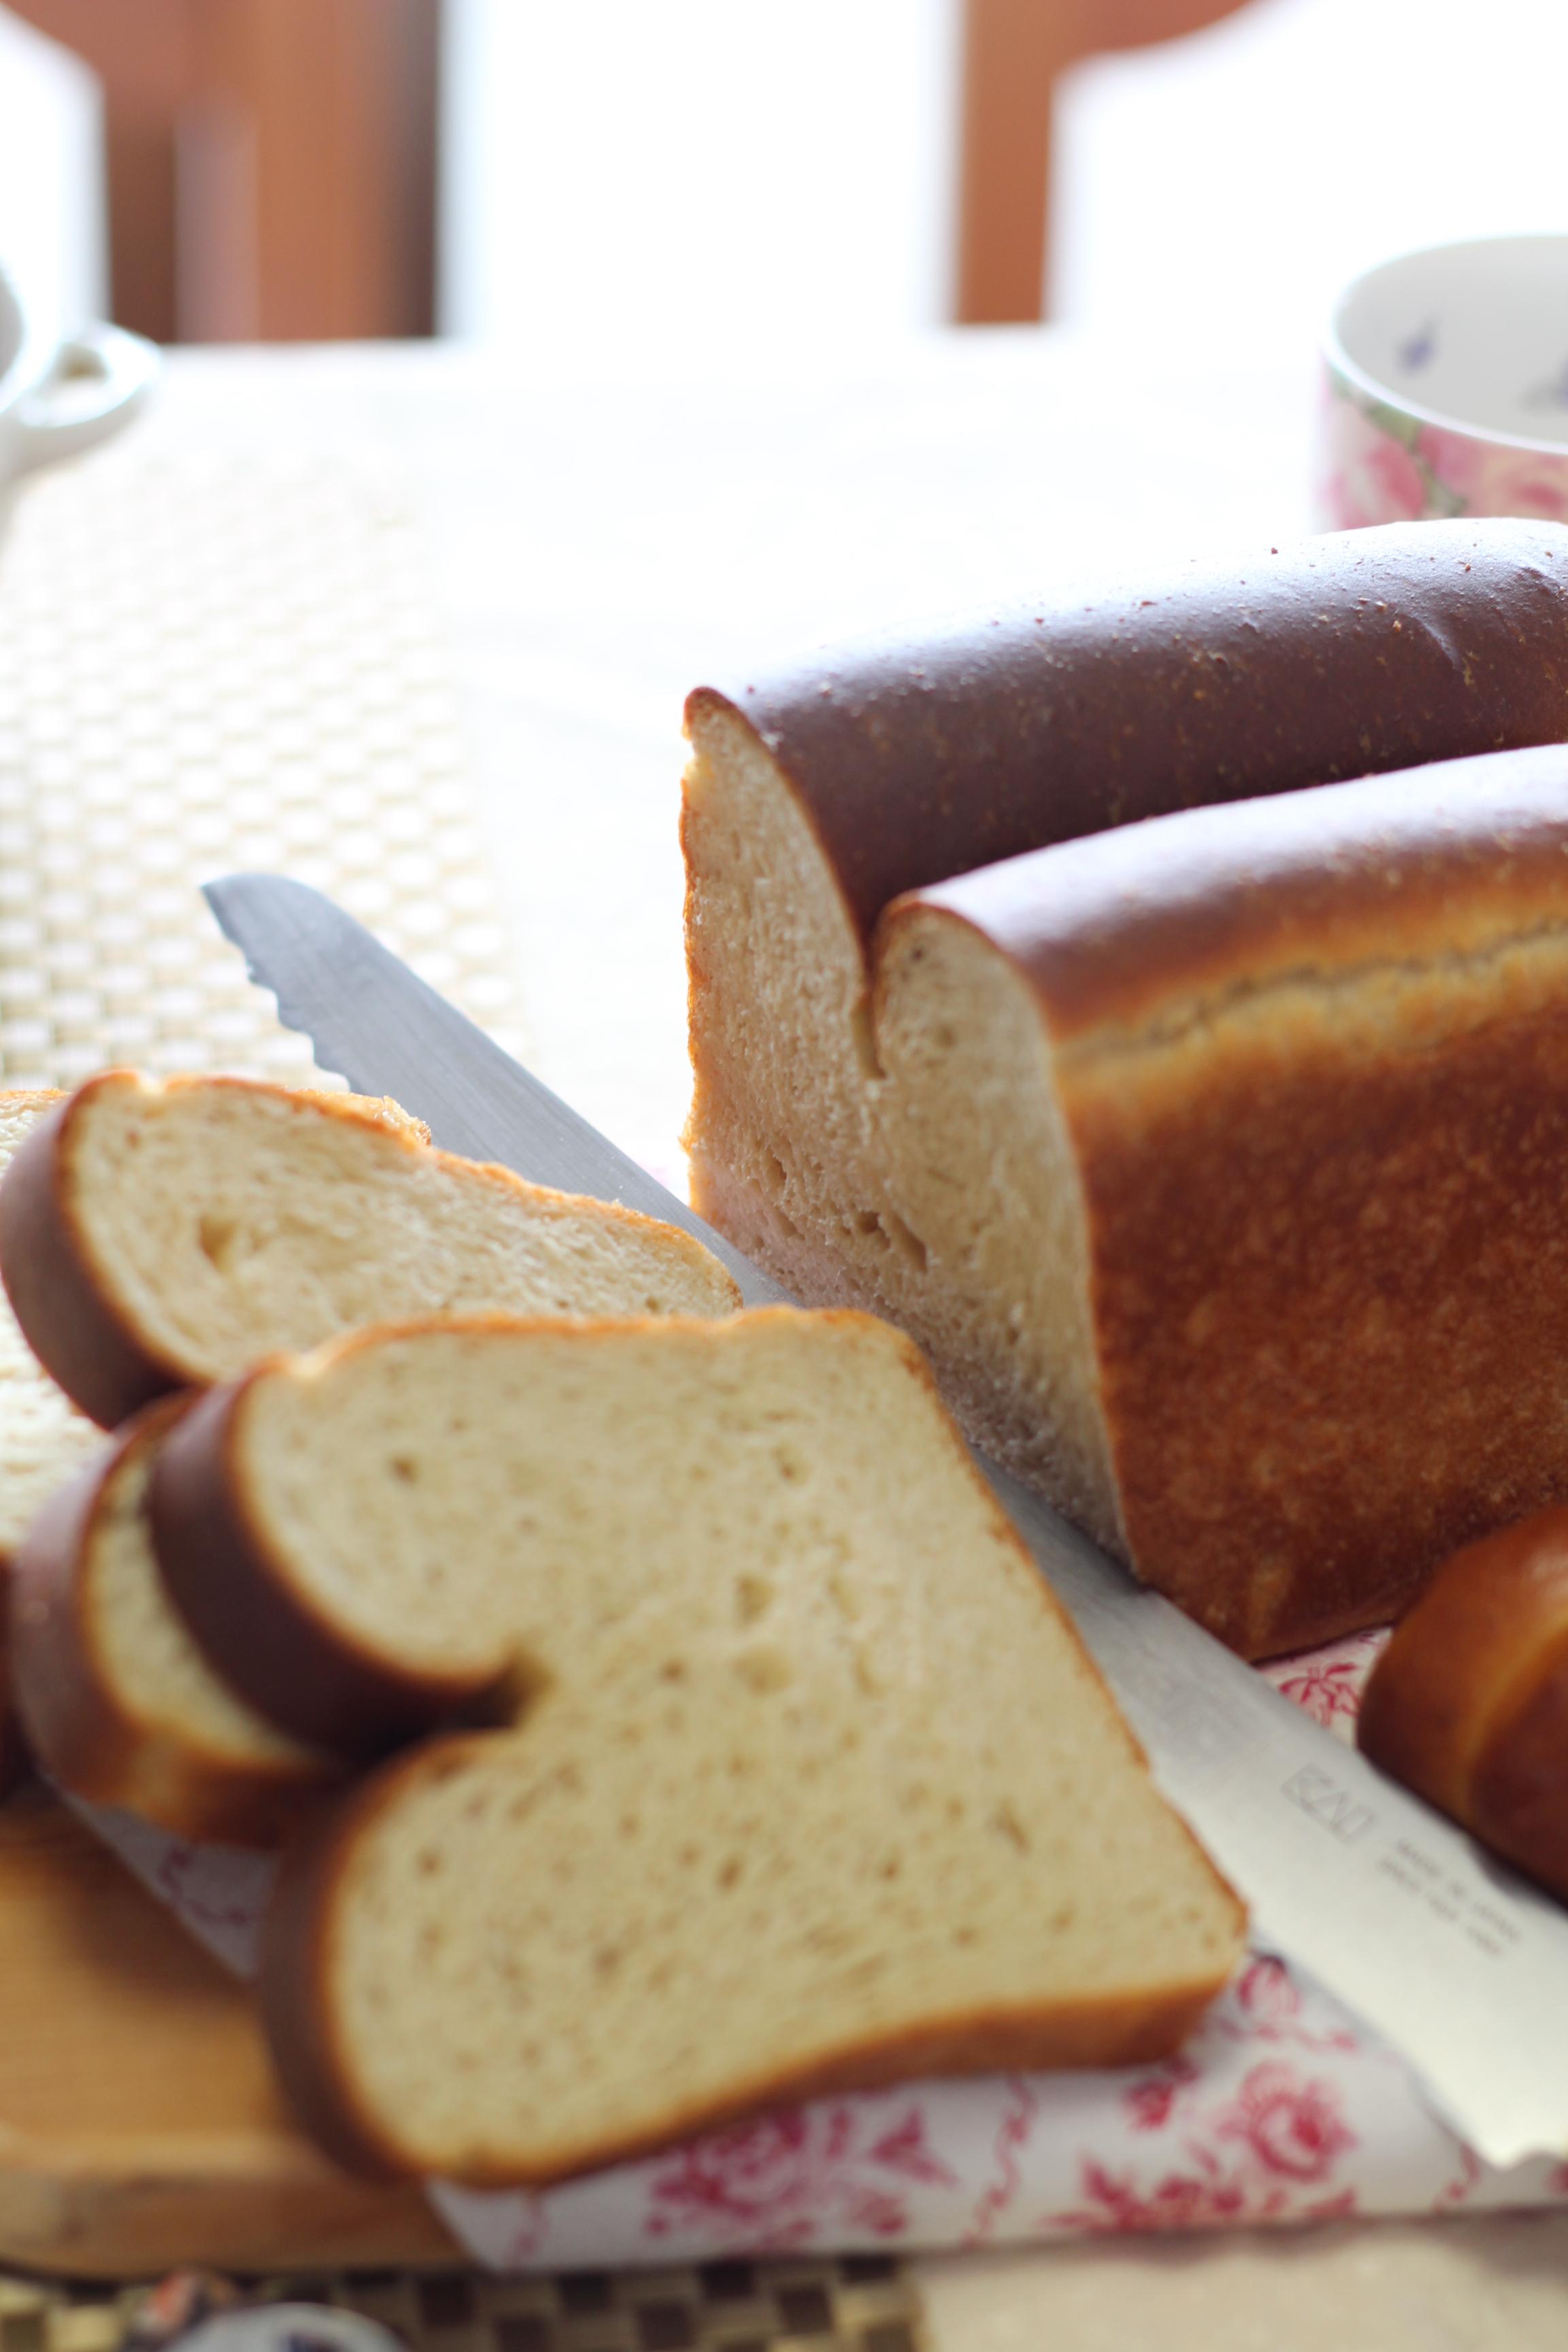 a-ta-sante糖質制限パン料理教室。京都江部粉糖質制限アドバンスコース最終会『変わり山食&ランチブレッド』